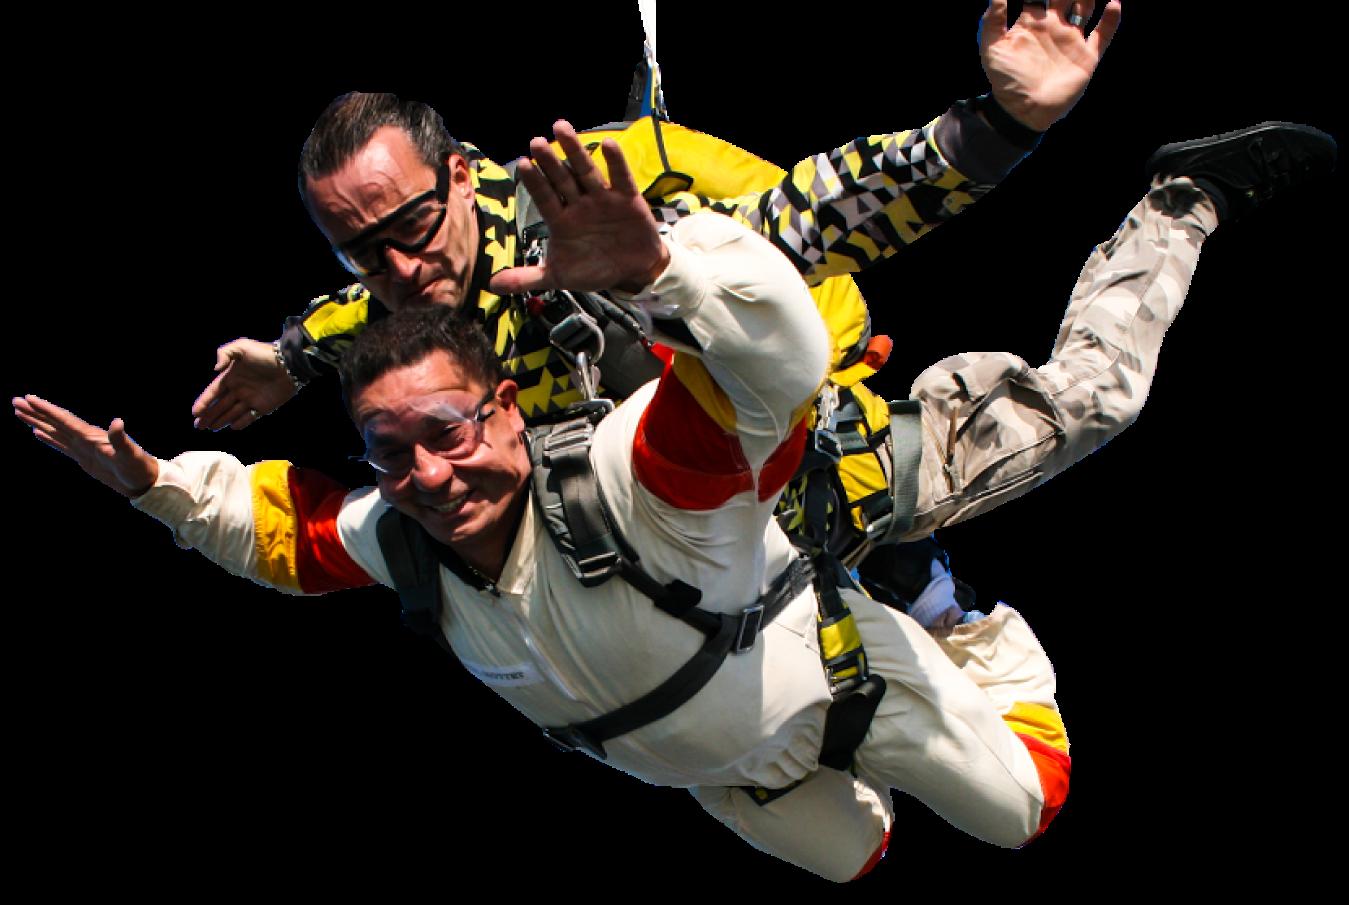 Skydiving Tulsa | Tulsa Skydive | Skydive Oklahoma -Skydive